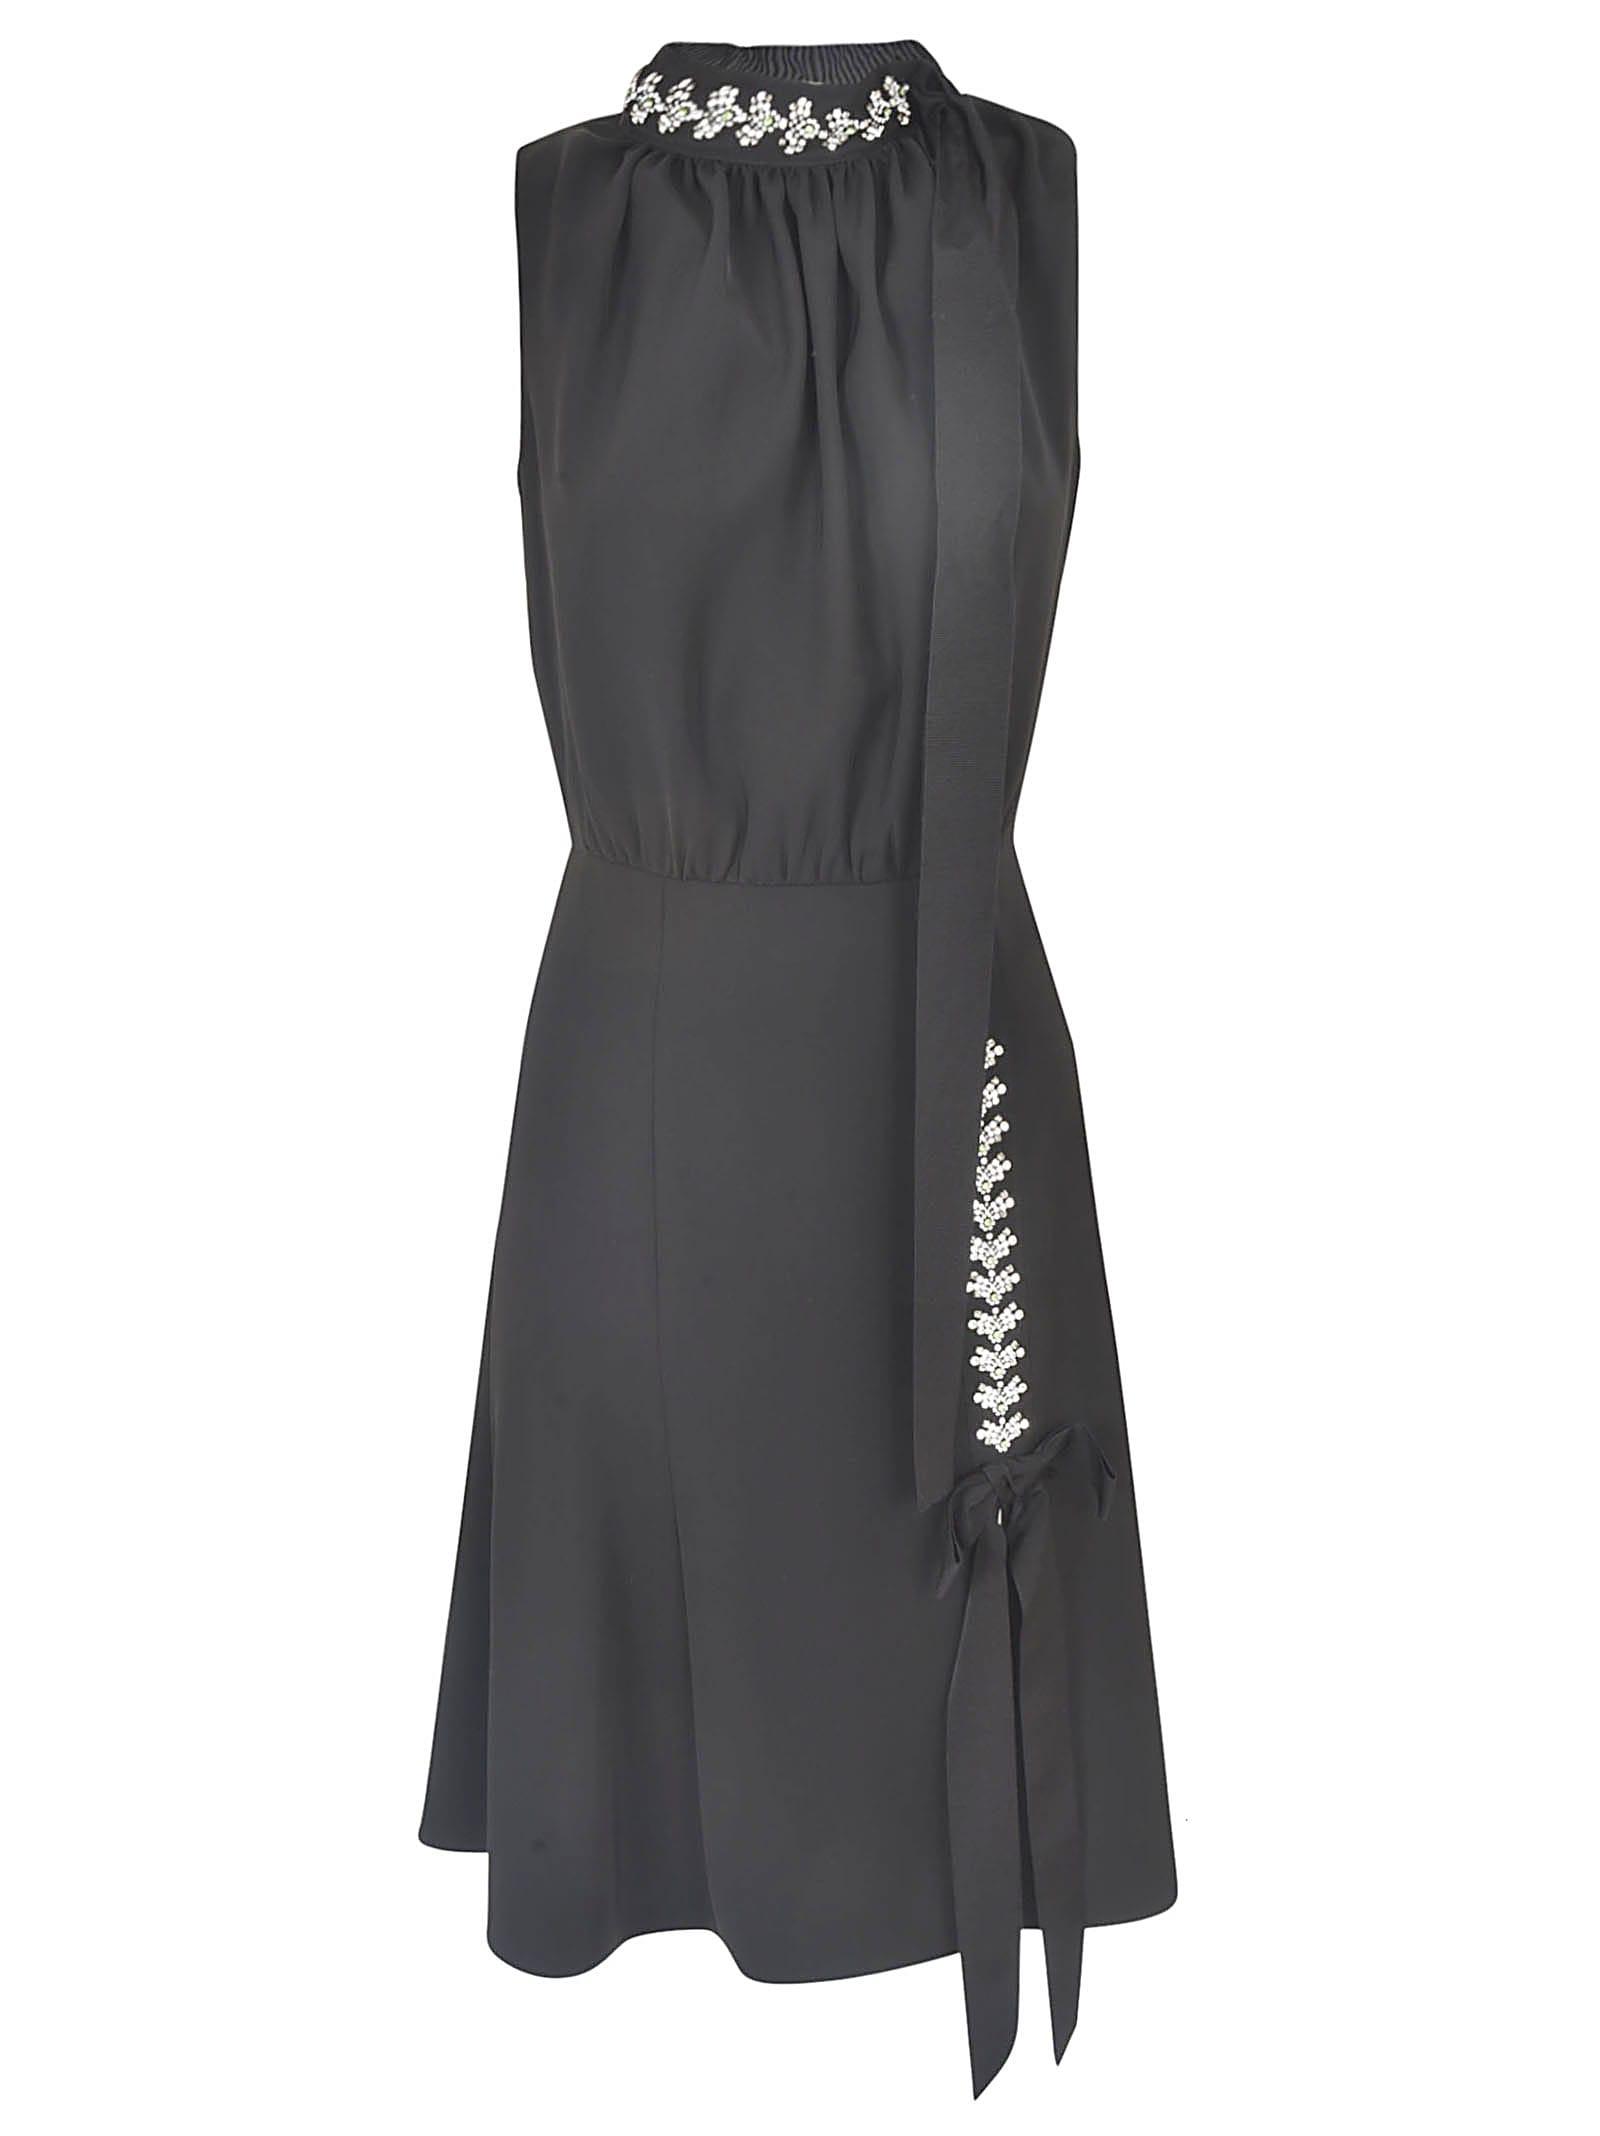 Buy Prada Crystal Embellished Sleeveless Dress online, shop Prada with free shipping